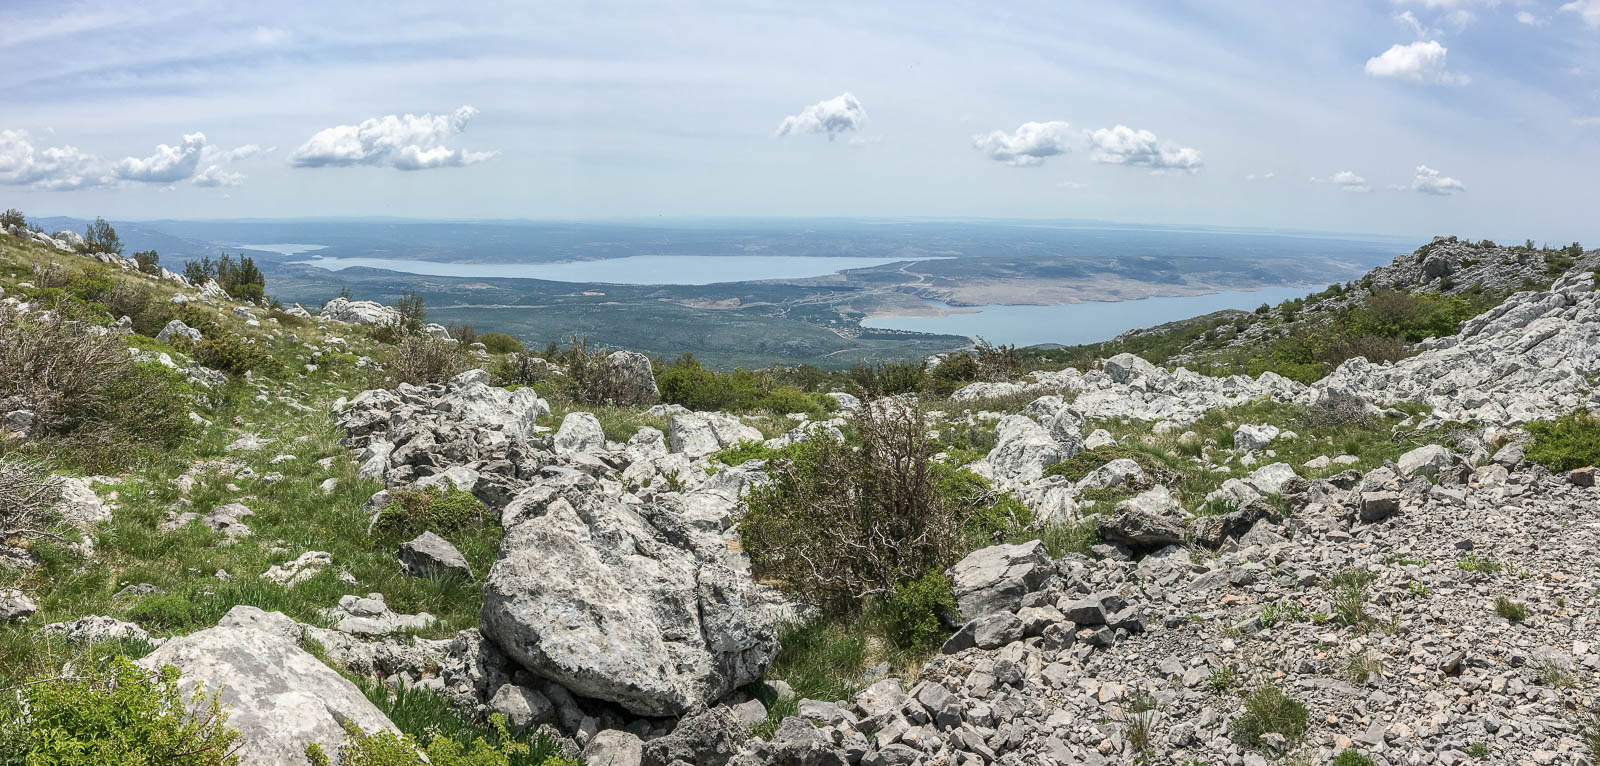 Majstorska cesta - A panoramic gravel road through some of